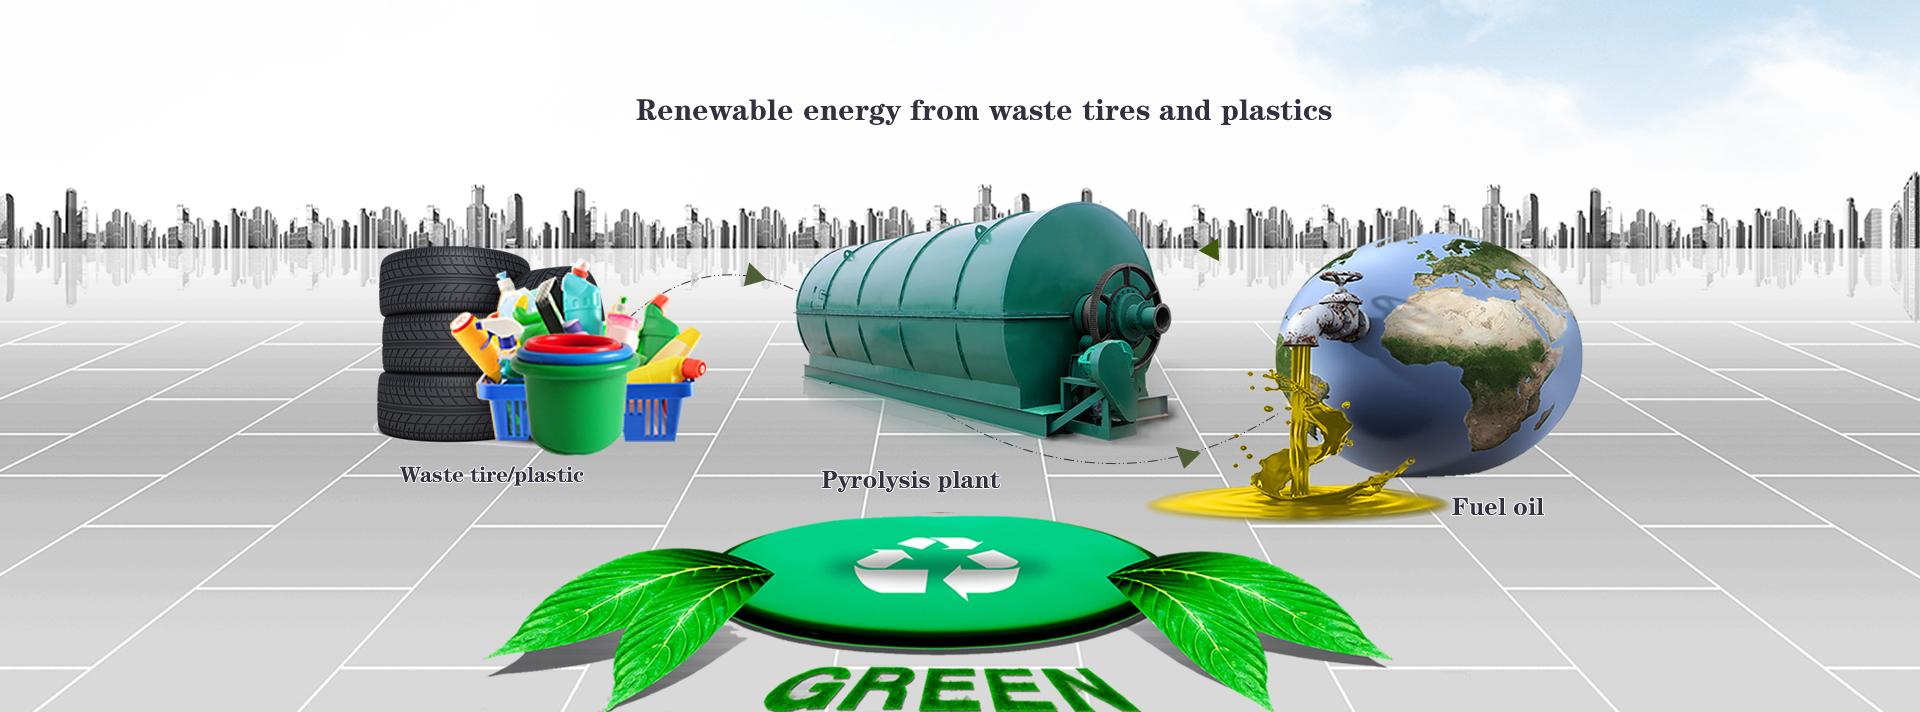 manufacturers Tire pyrolysis plant,pyrolysis plant,pyrolysis oil